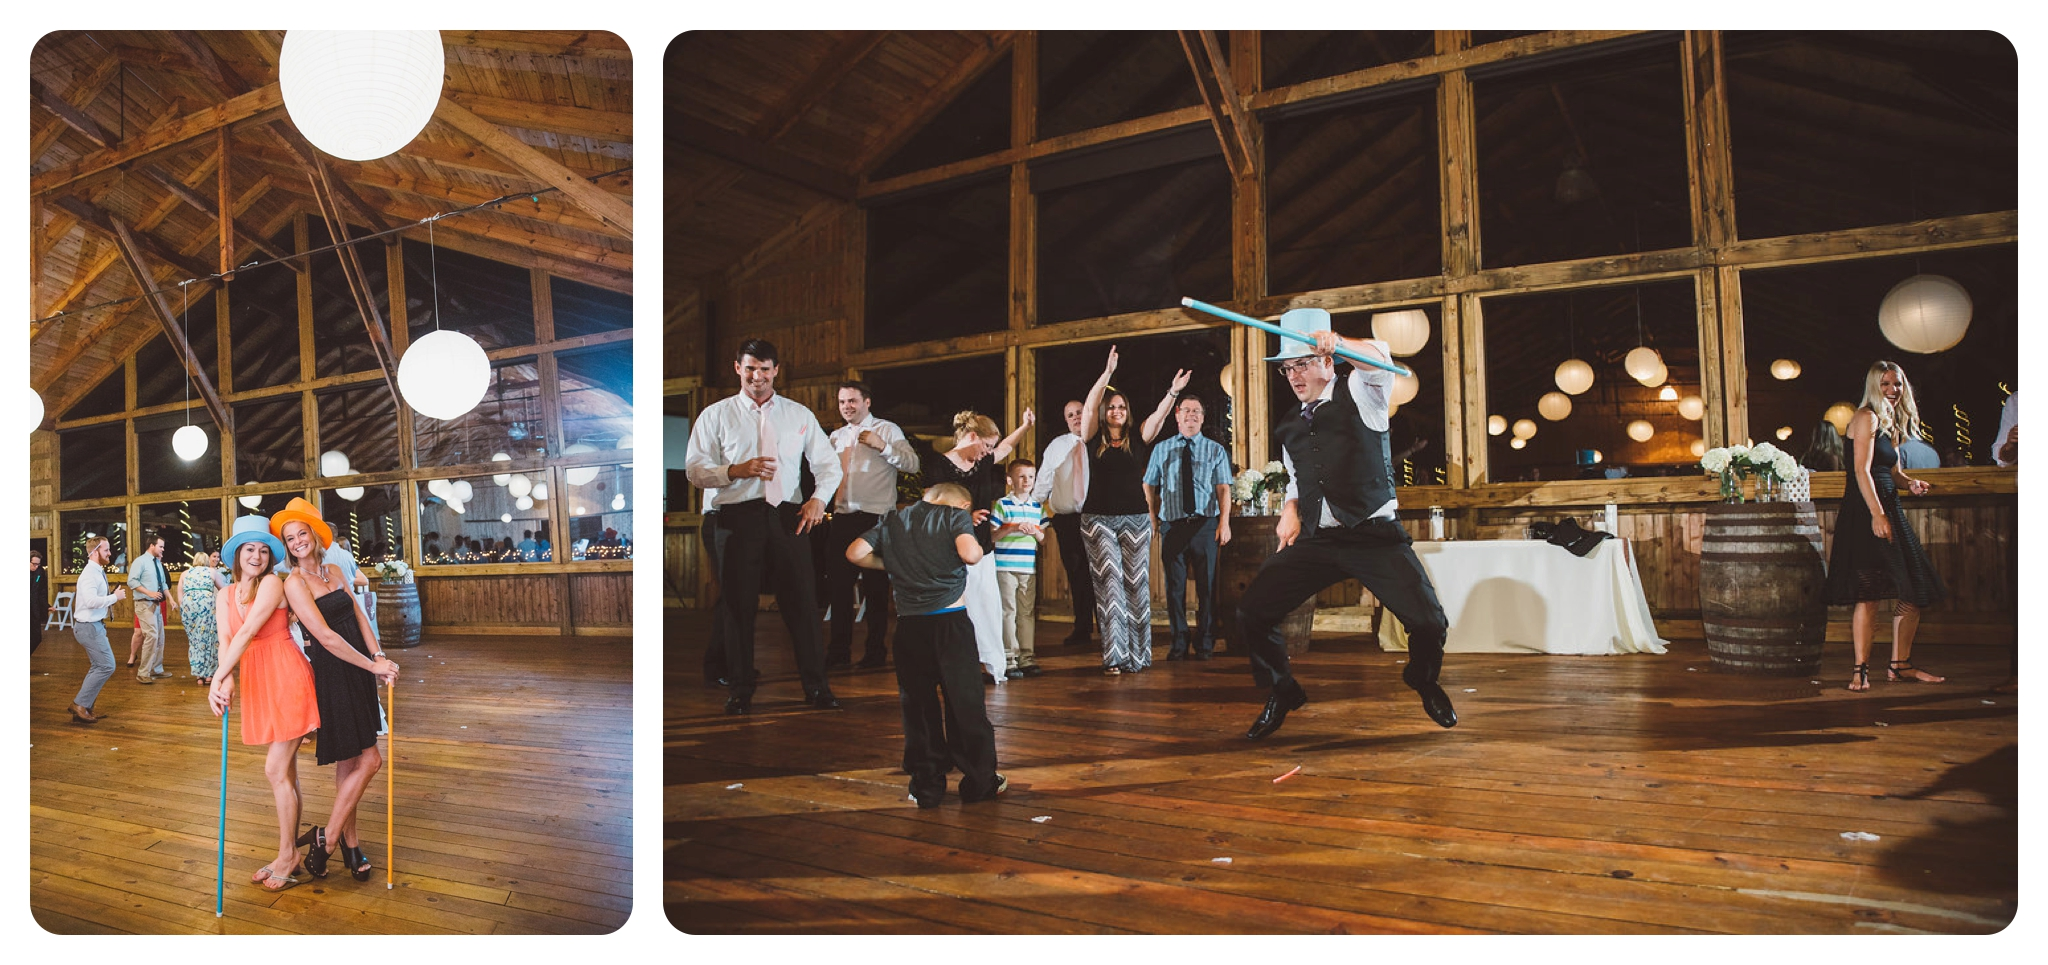 Braeloch-Weddings-Wedding-Photographer-Pat-Cori-Photography-046.jpg